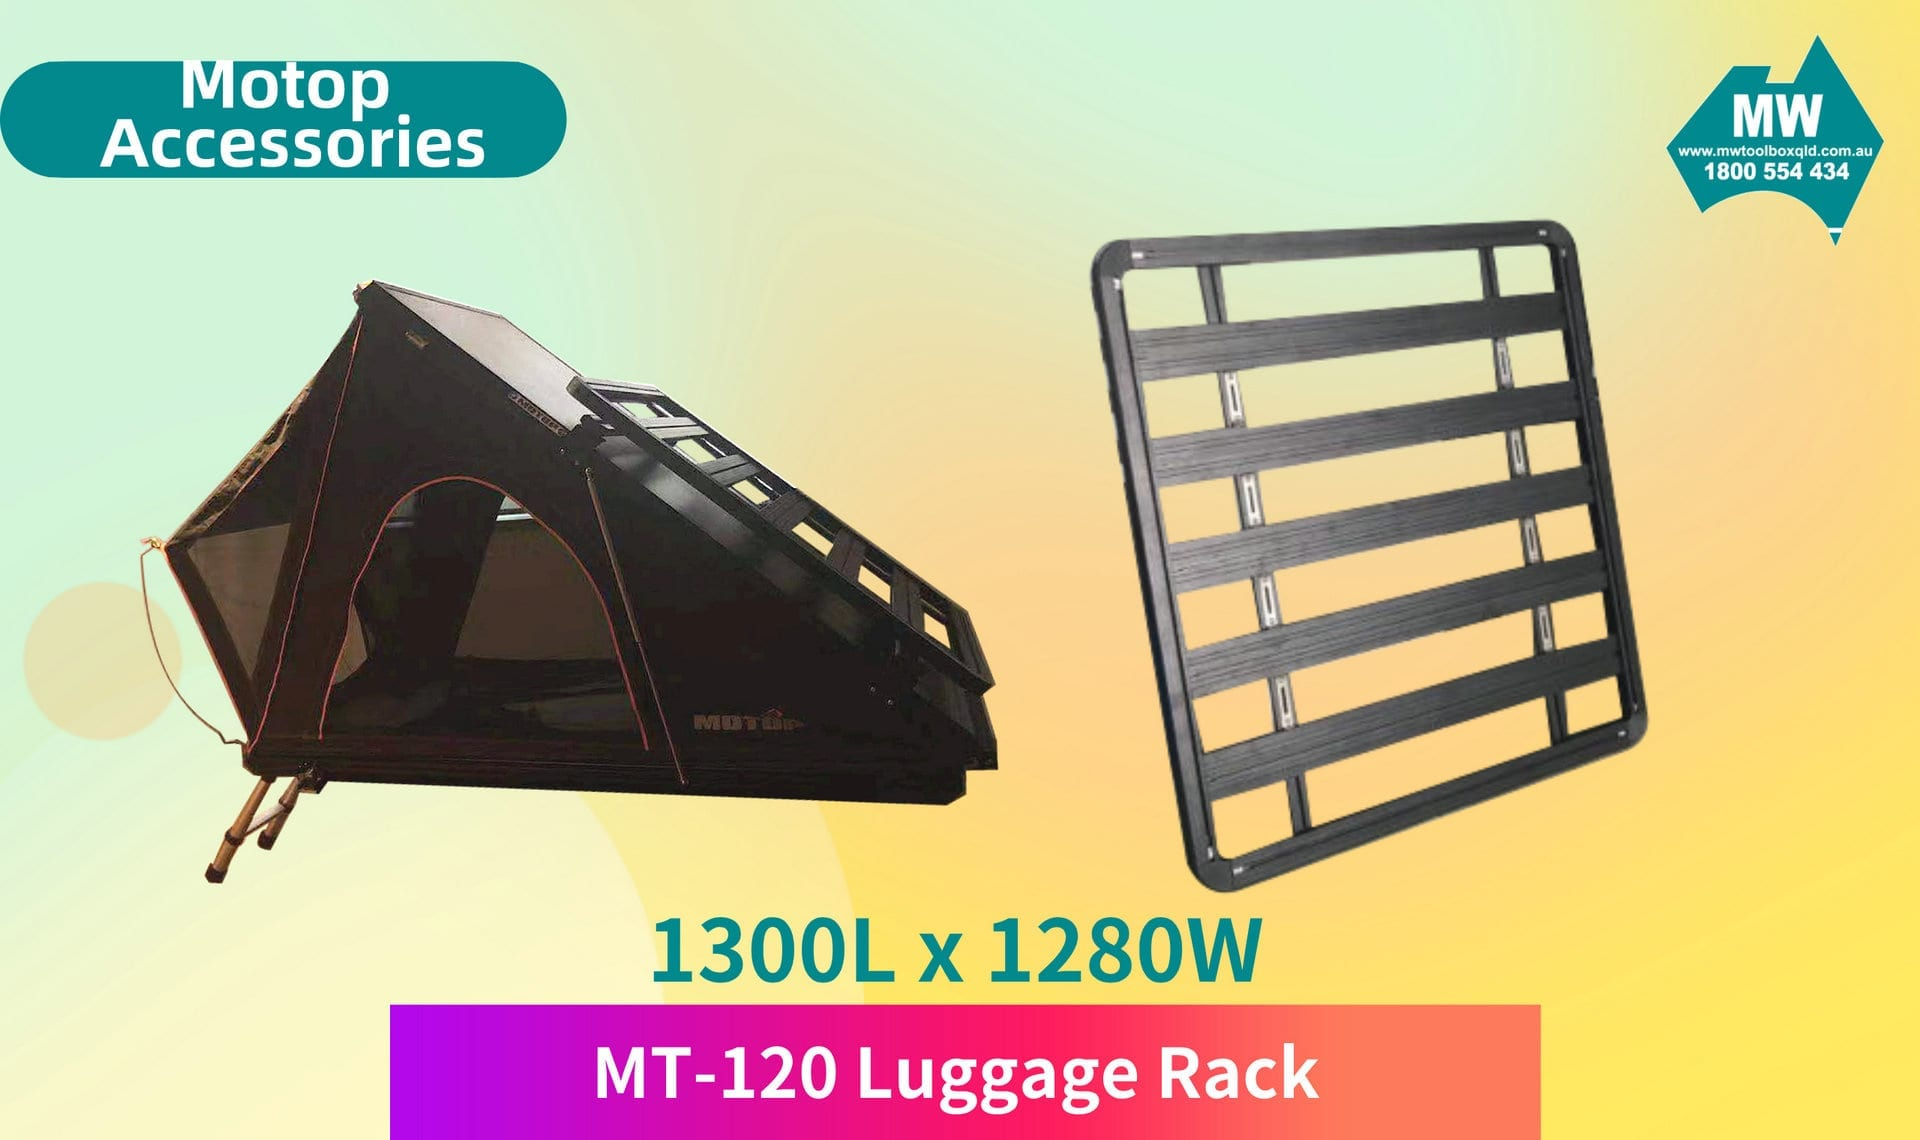 MT-120 Luggage Rack